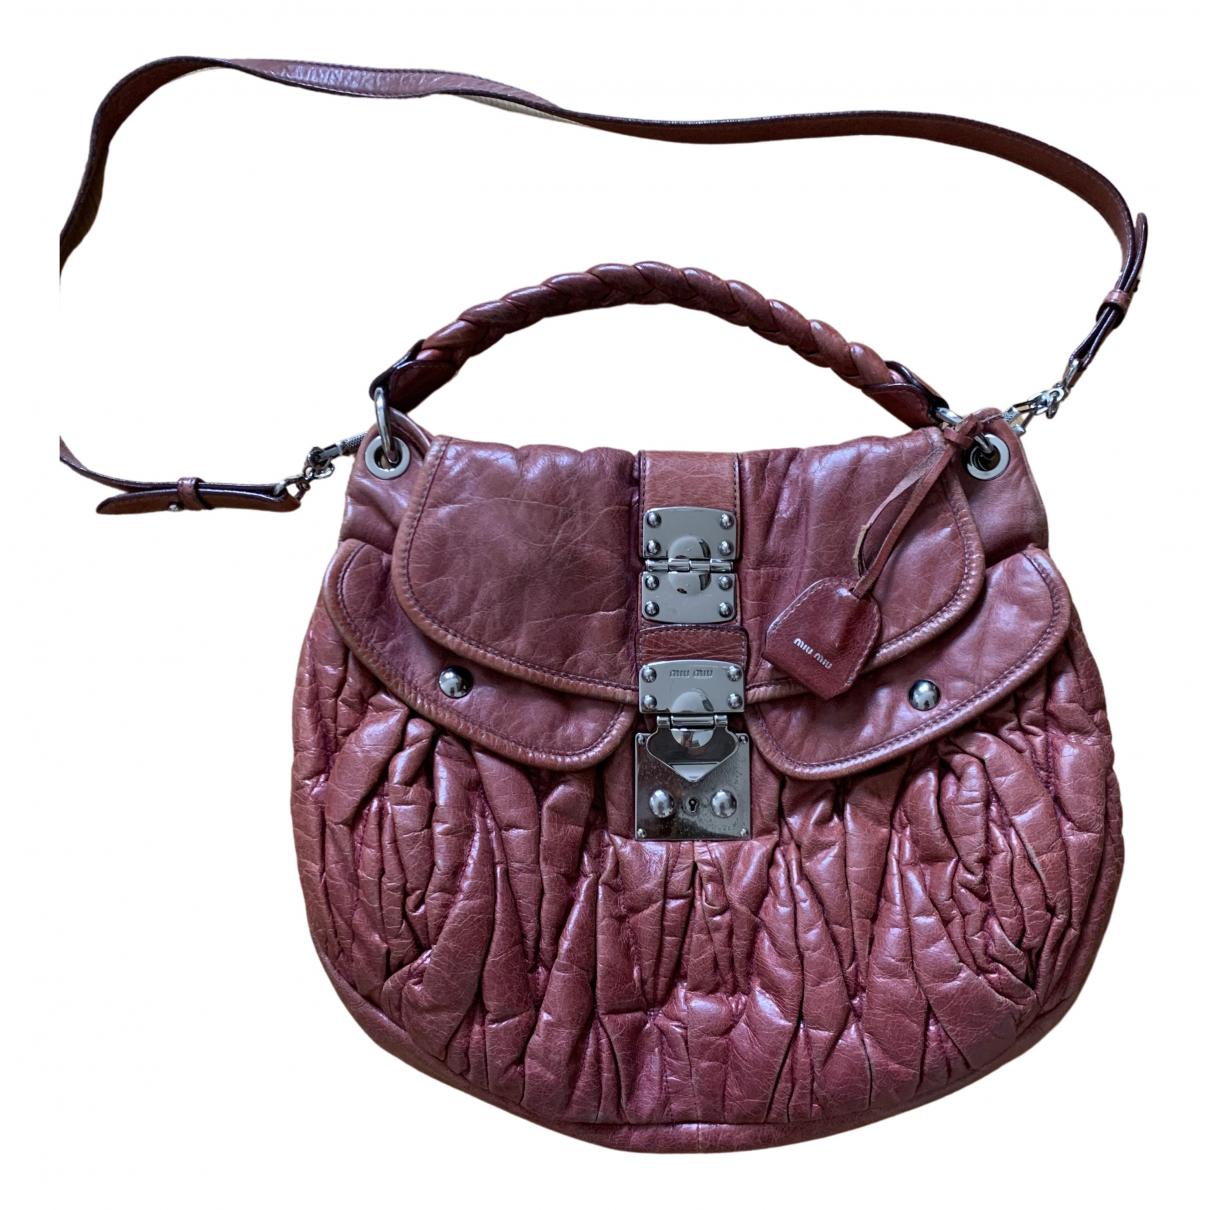 Miu Miu Coffer Handtasche in  Bordeauxrot Leder